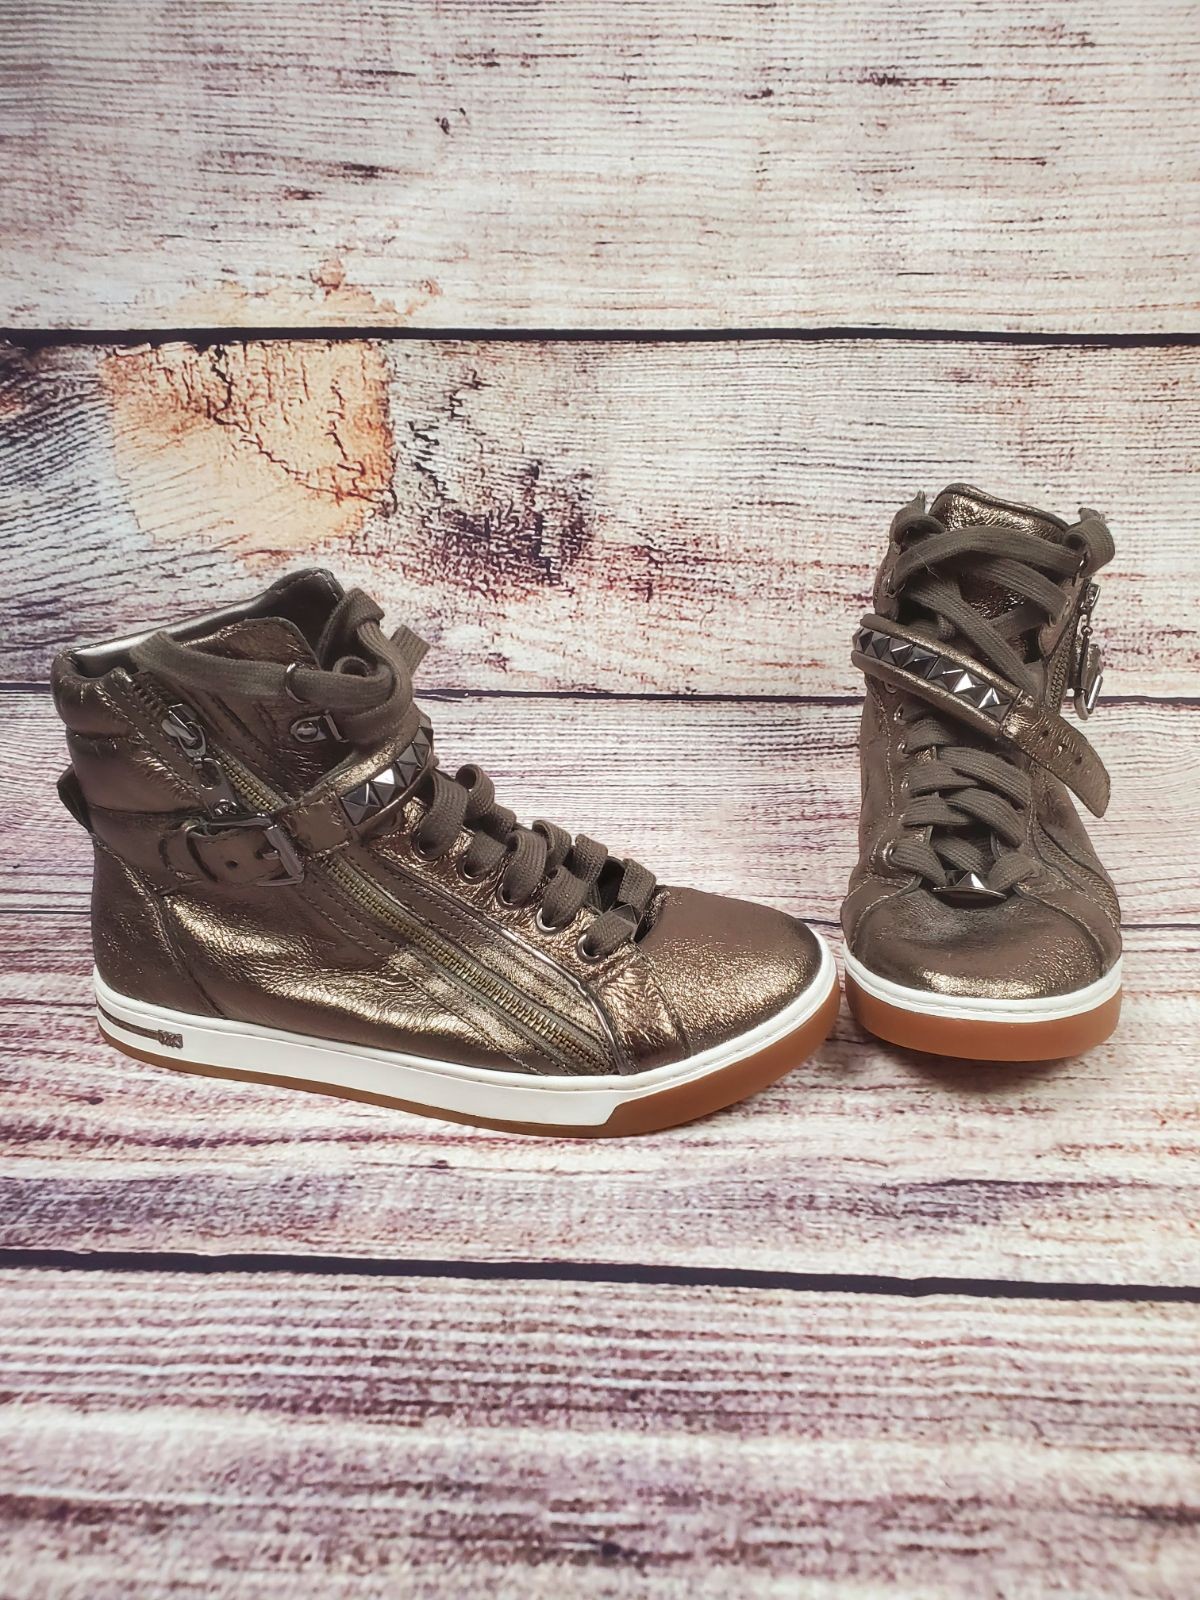 Michael Kors Studded Hi Top Sneaker